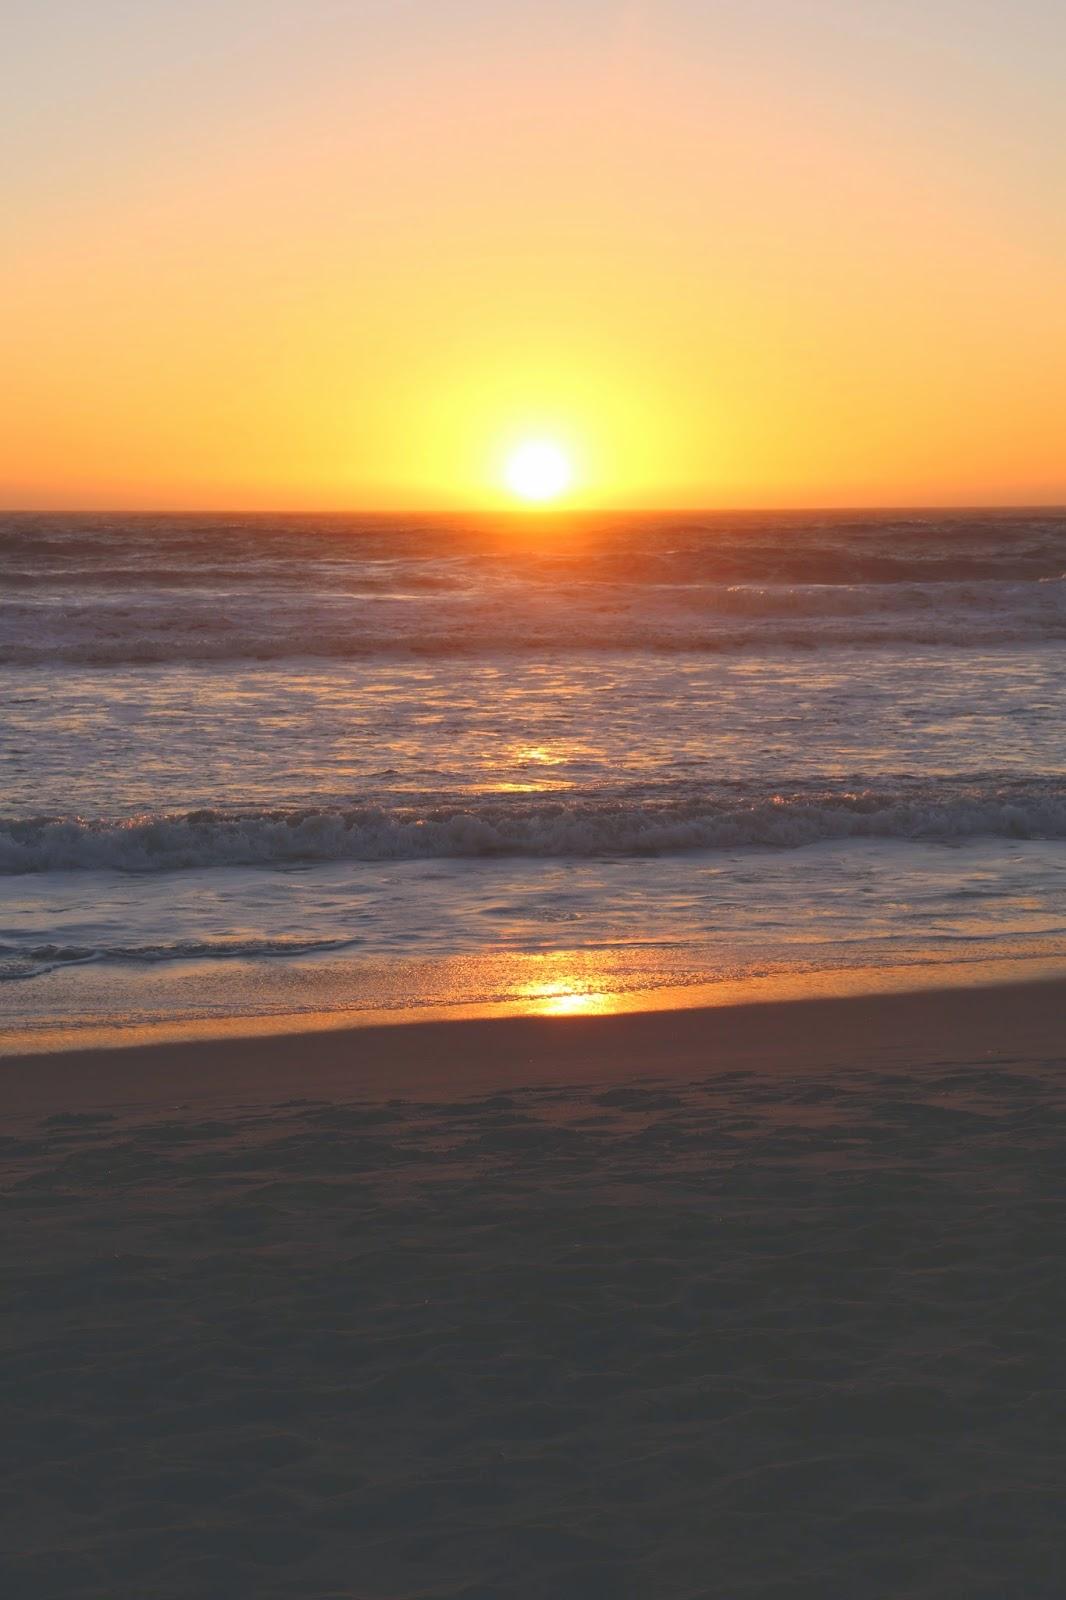 A Beautiful Sunset in Santa Monica, California